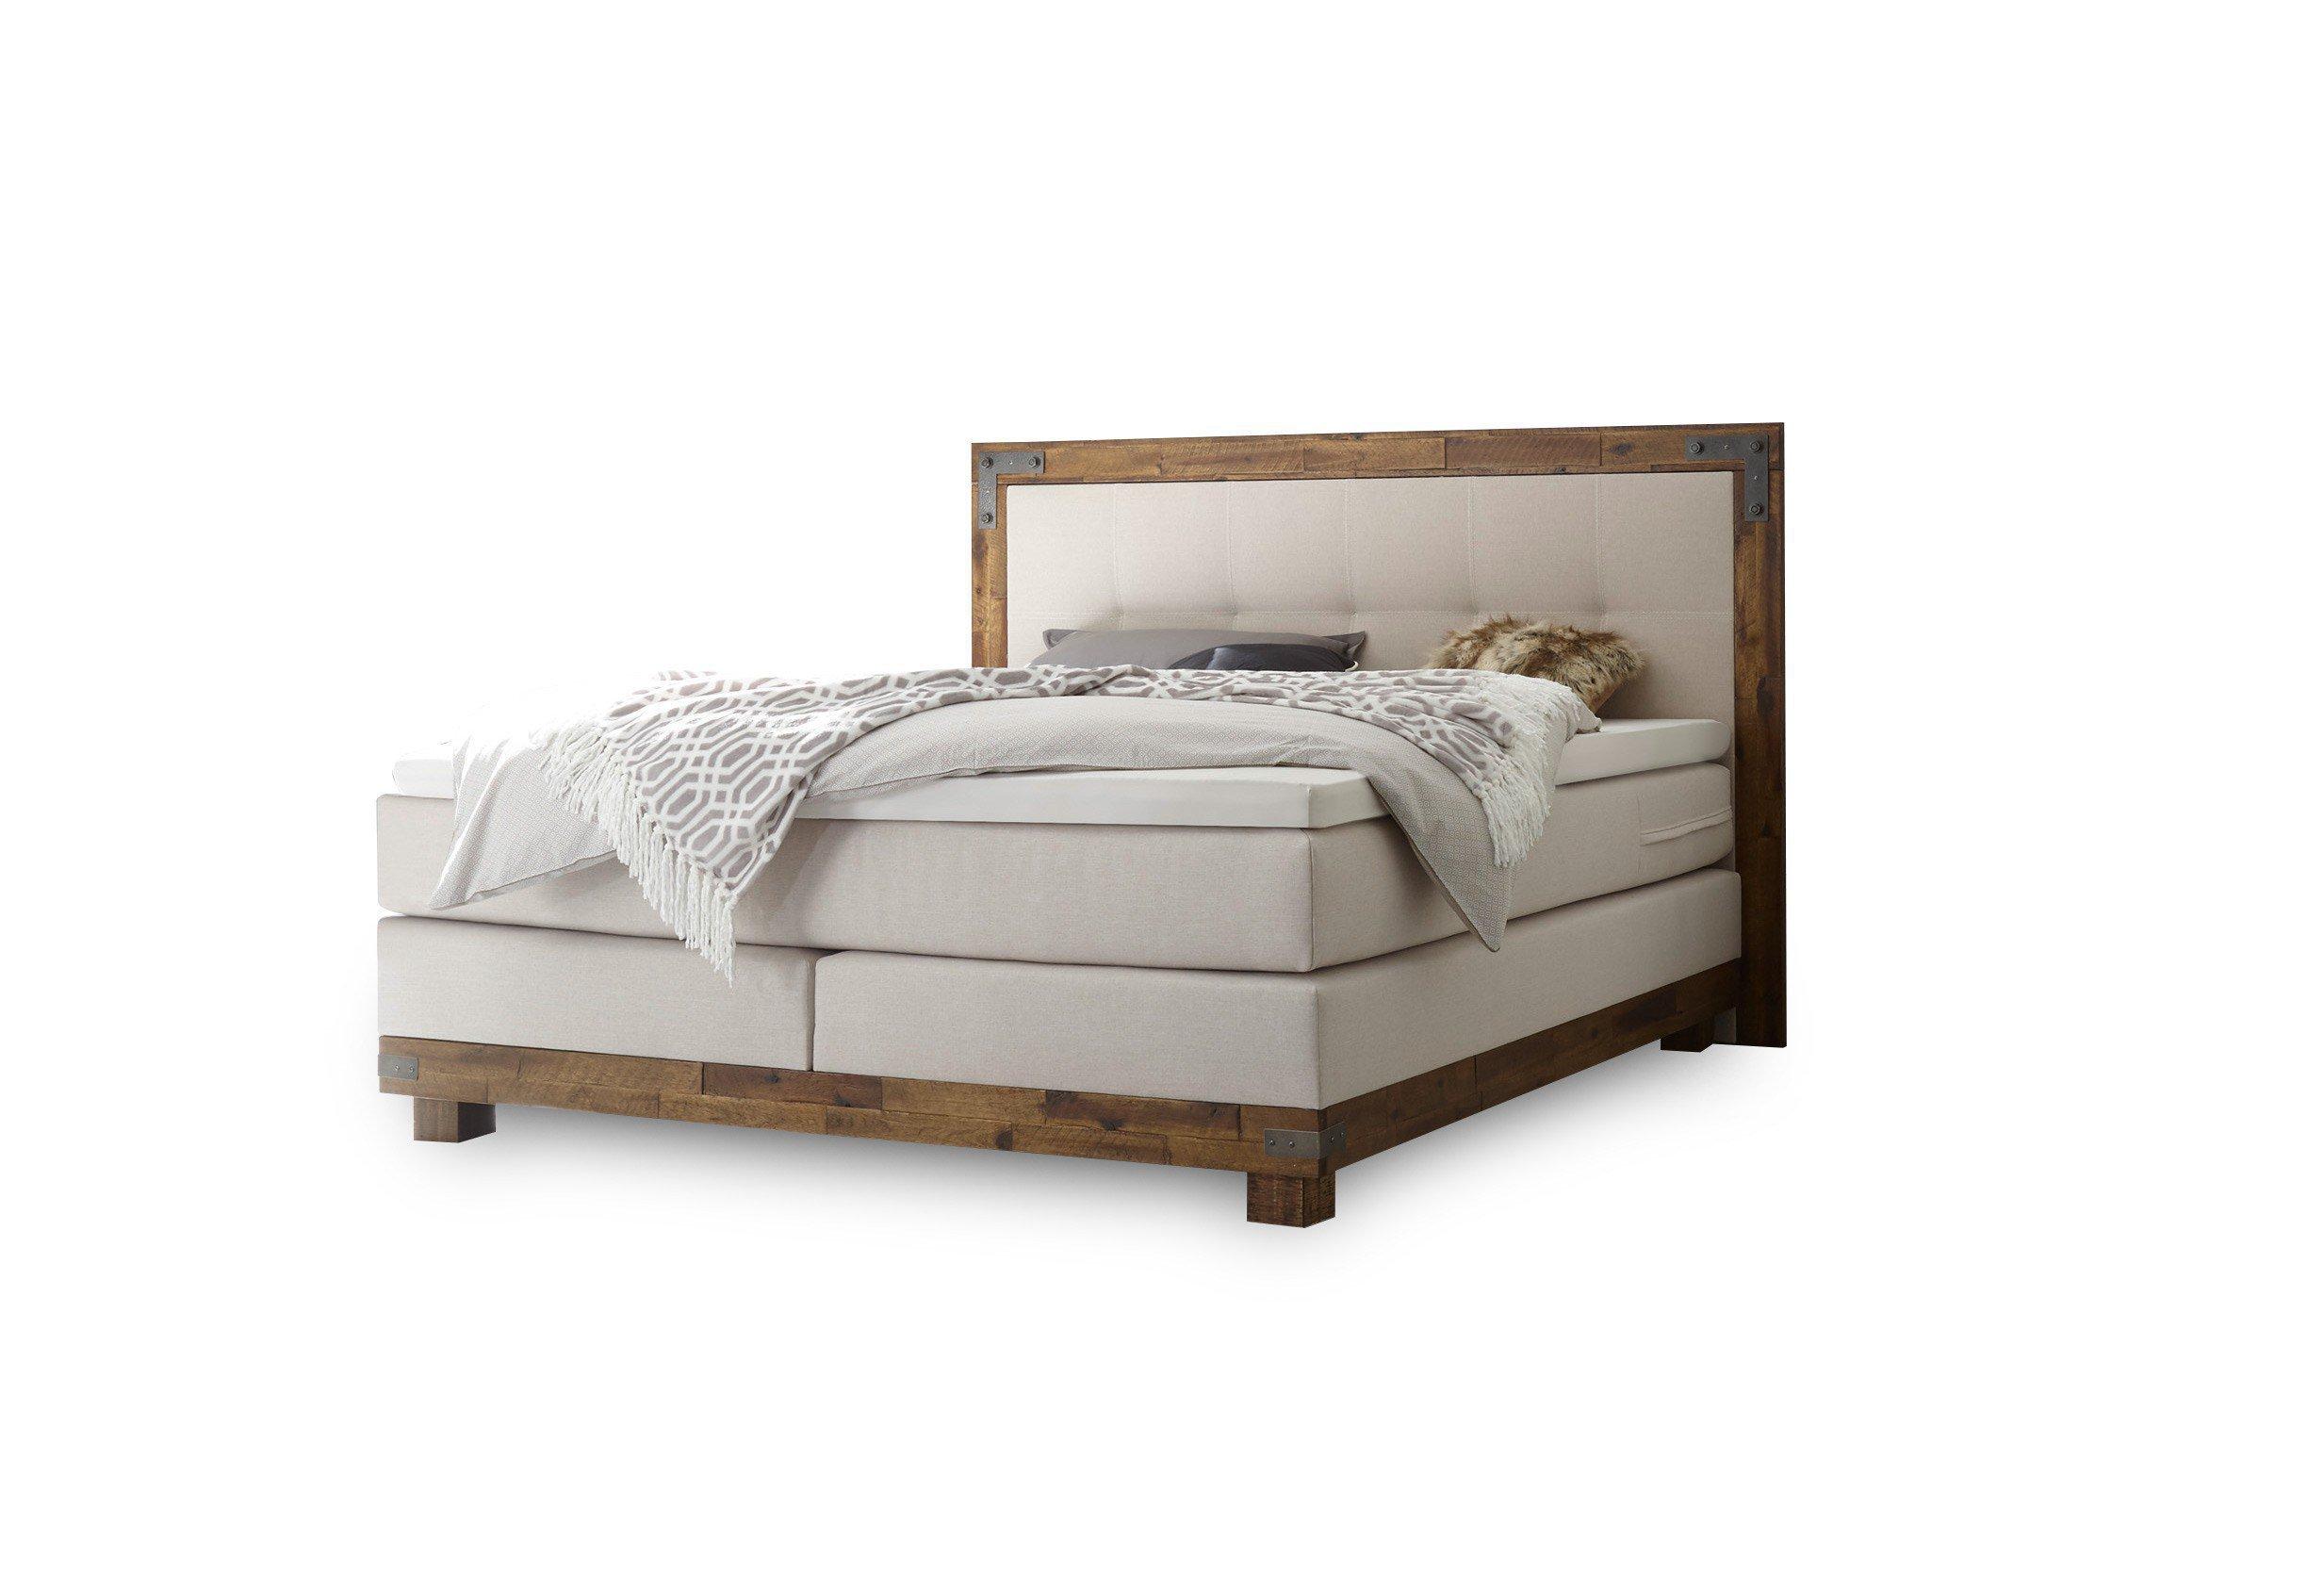 hasena pronto chicago boxspringbett inklusive topper m bel letz ihr online shop. Black Bedroom Furniture Sets. Home Design Ideas